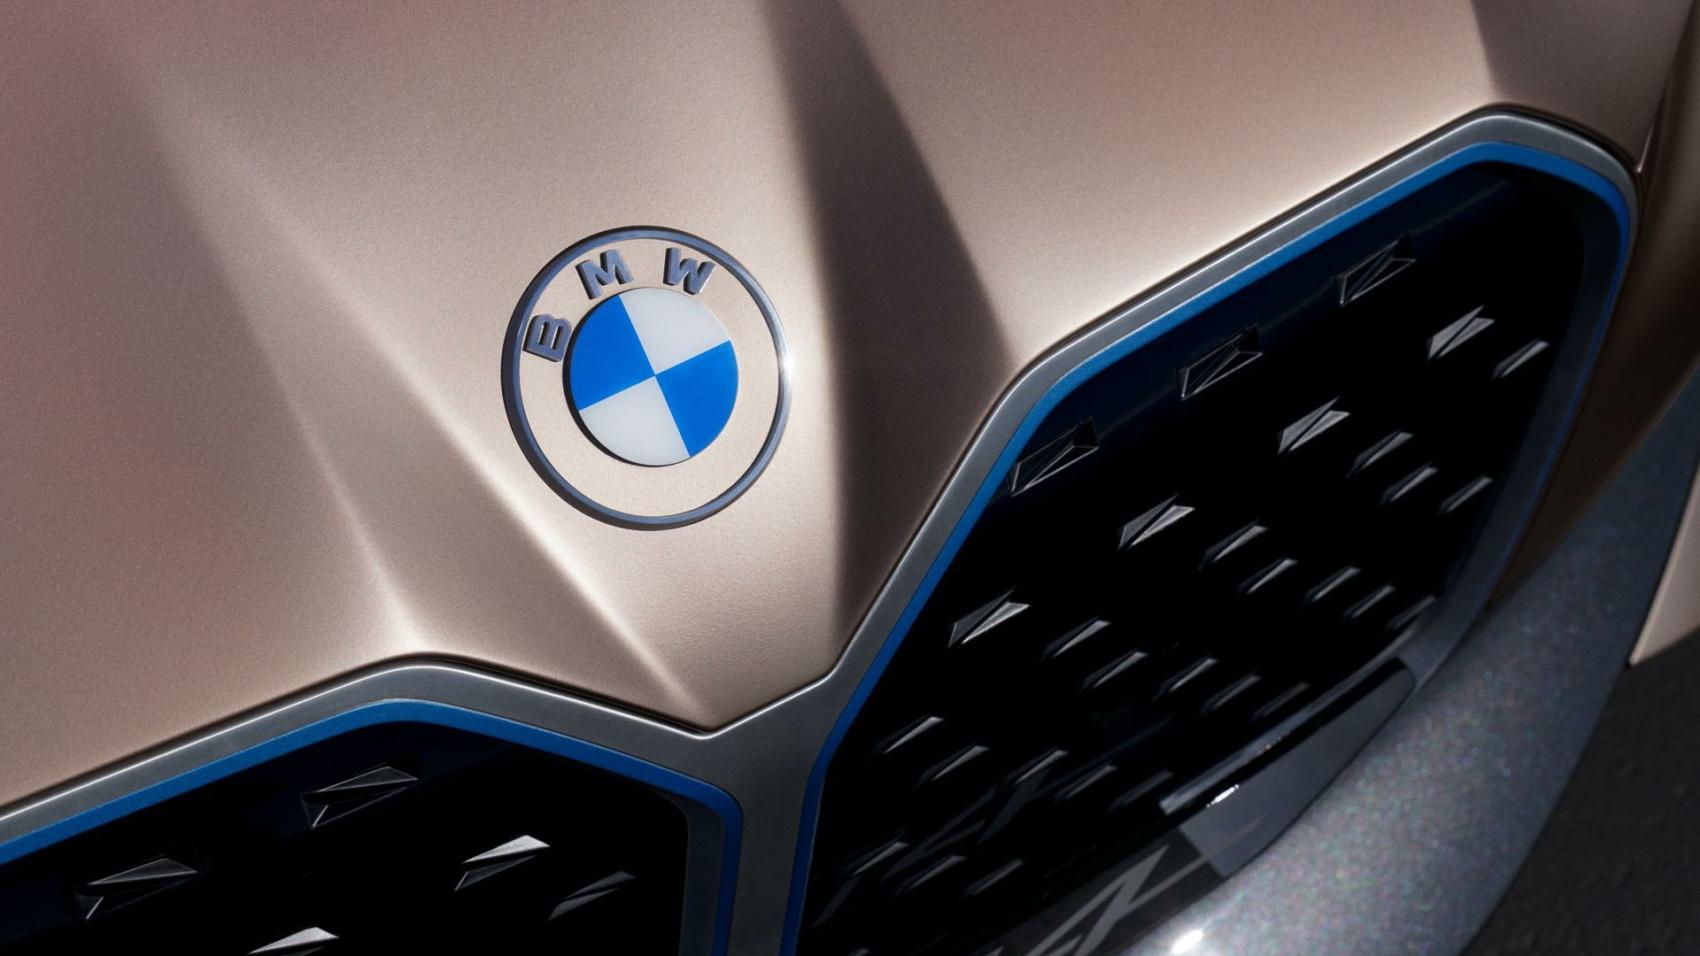 BMW-Concept-i4-images-11